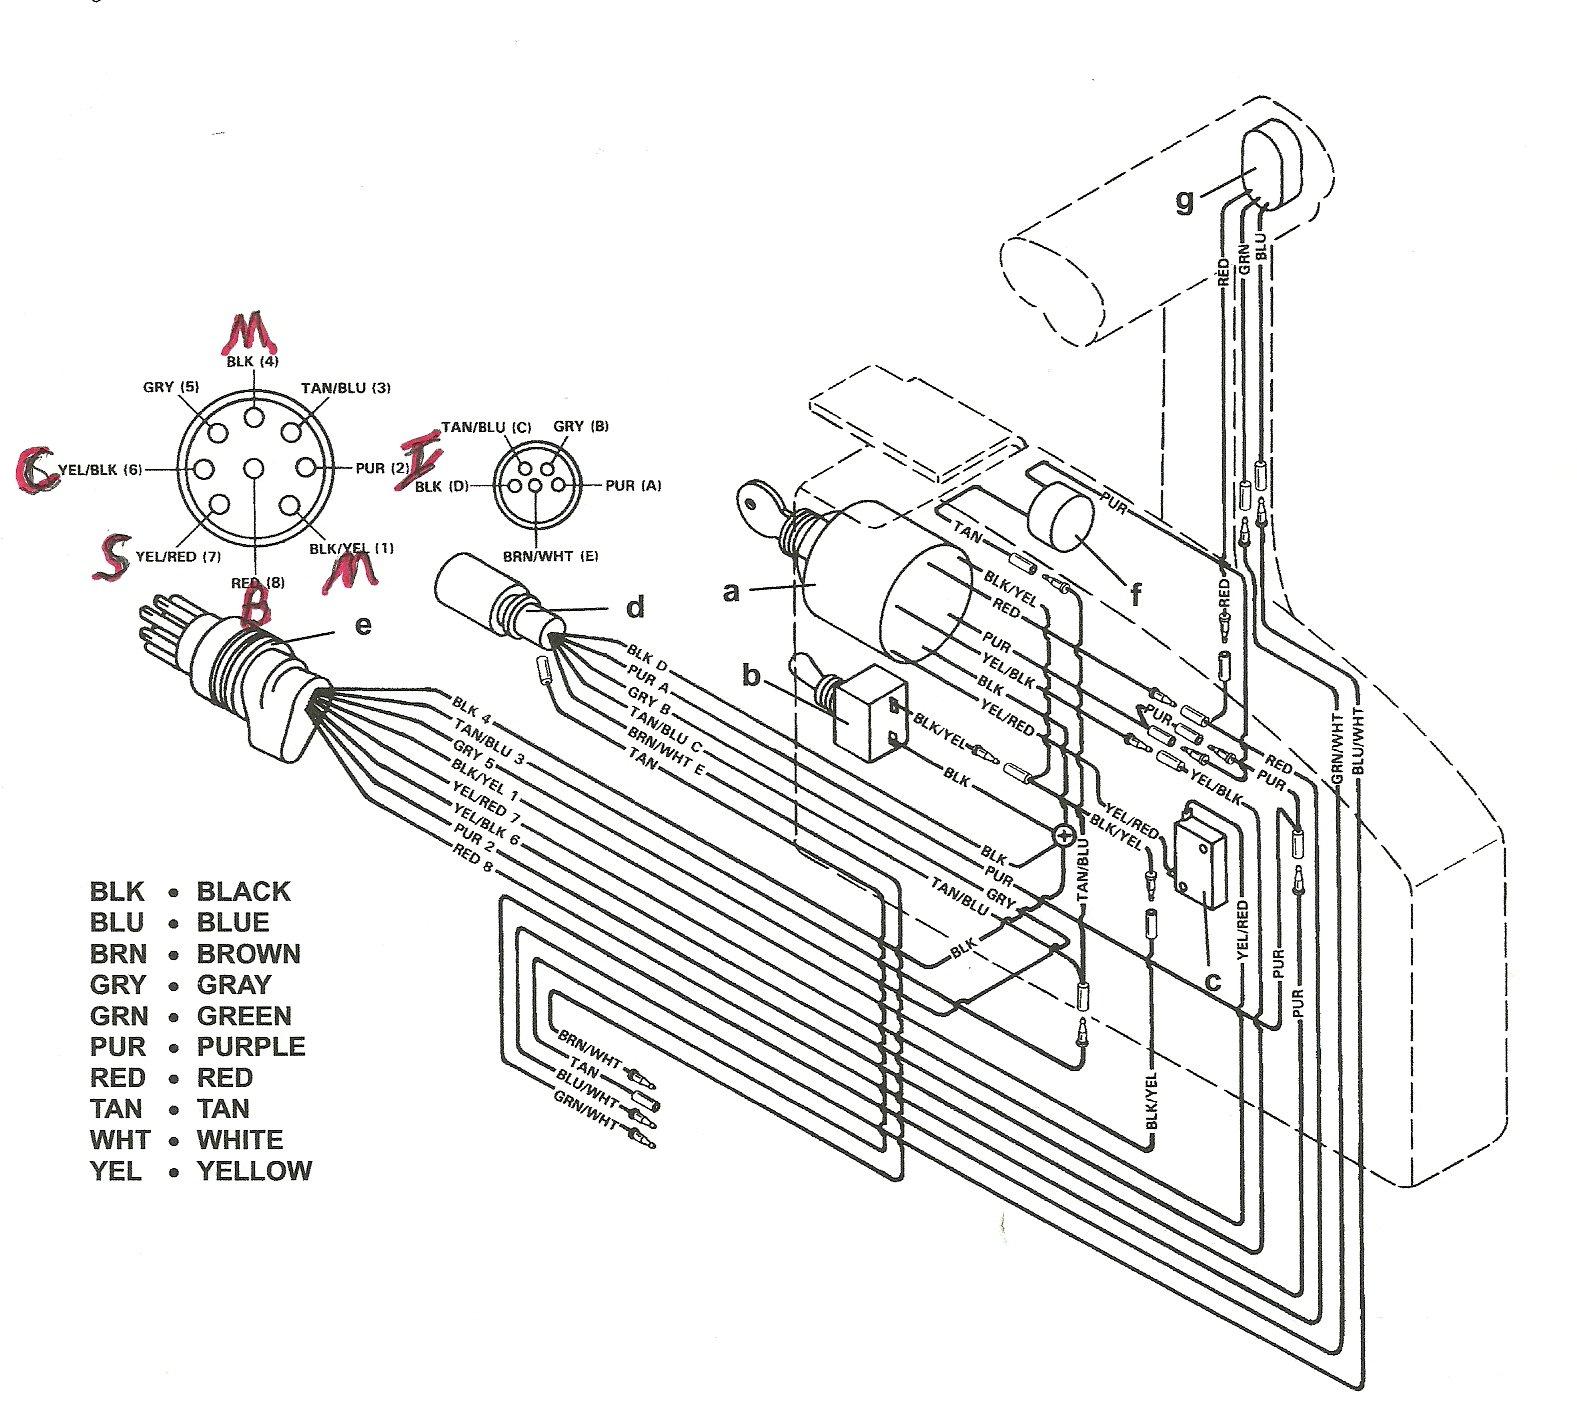 Wiring Diagram For Sundancer Tri Toon